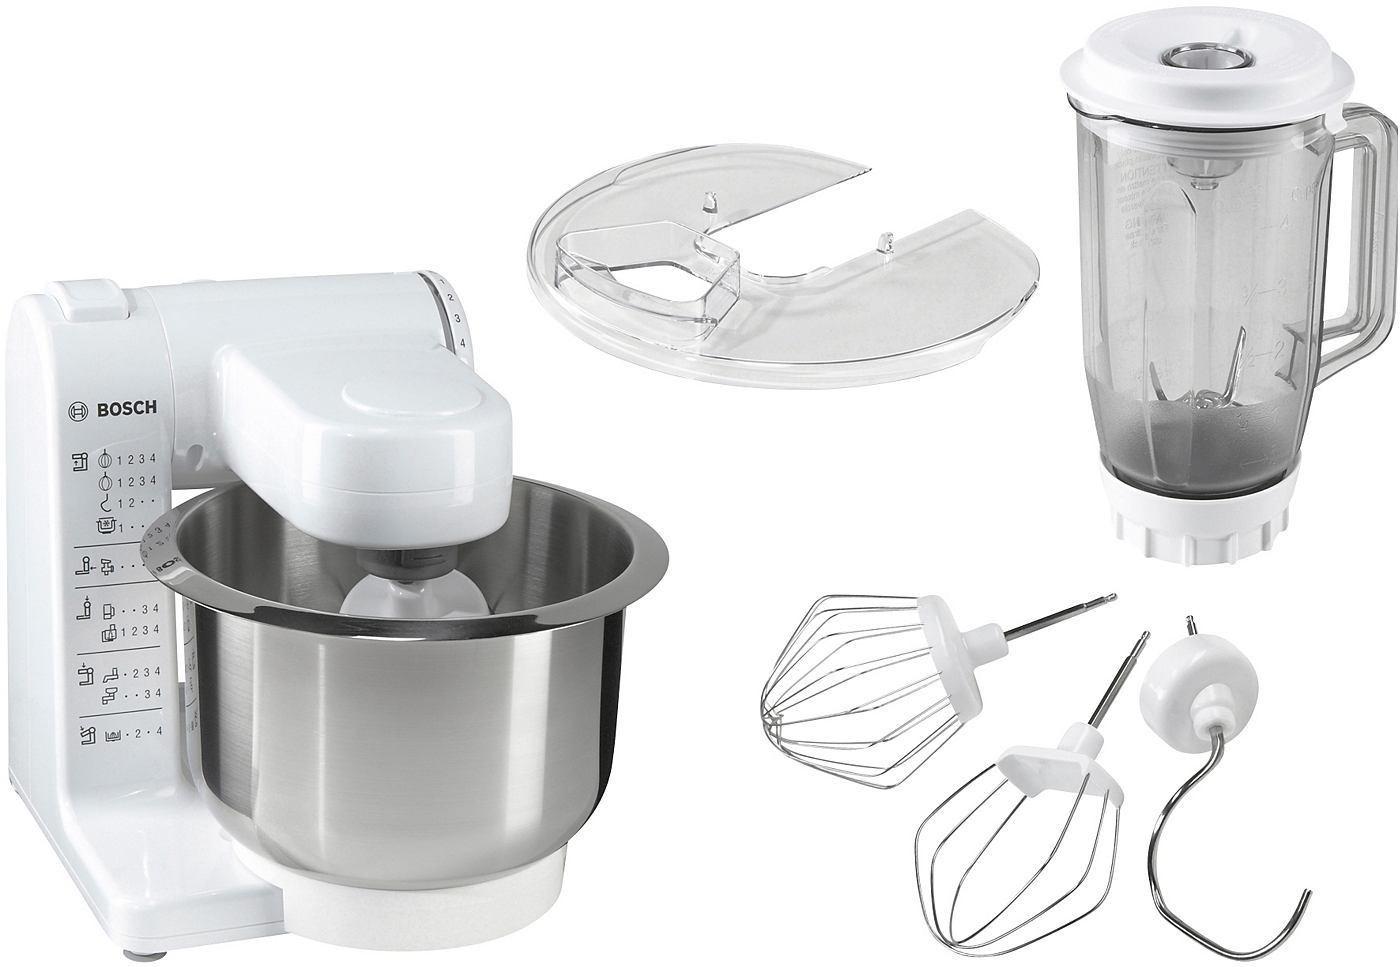 Bosch MUM4409 Keukenmachine   Prijzen   Twea